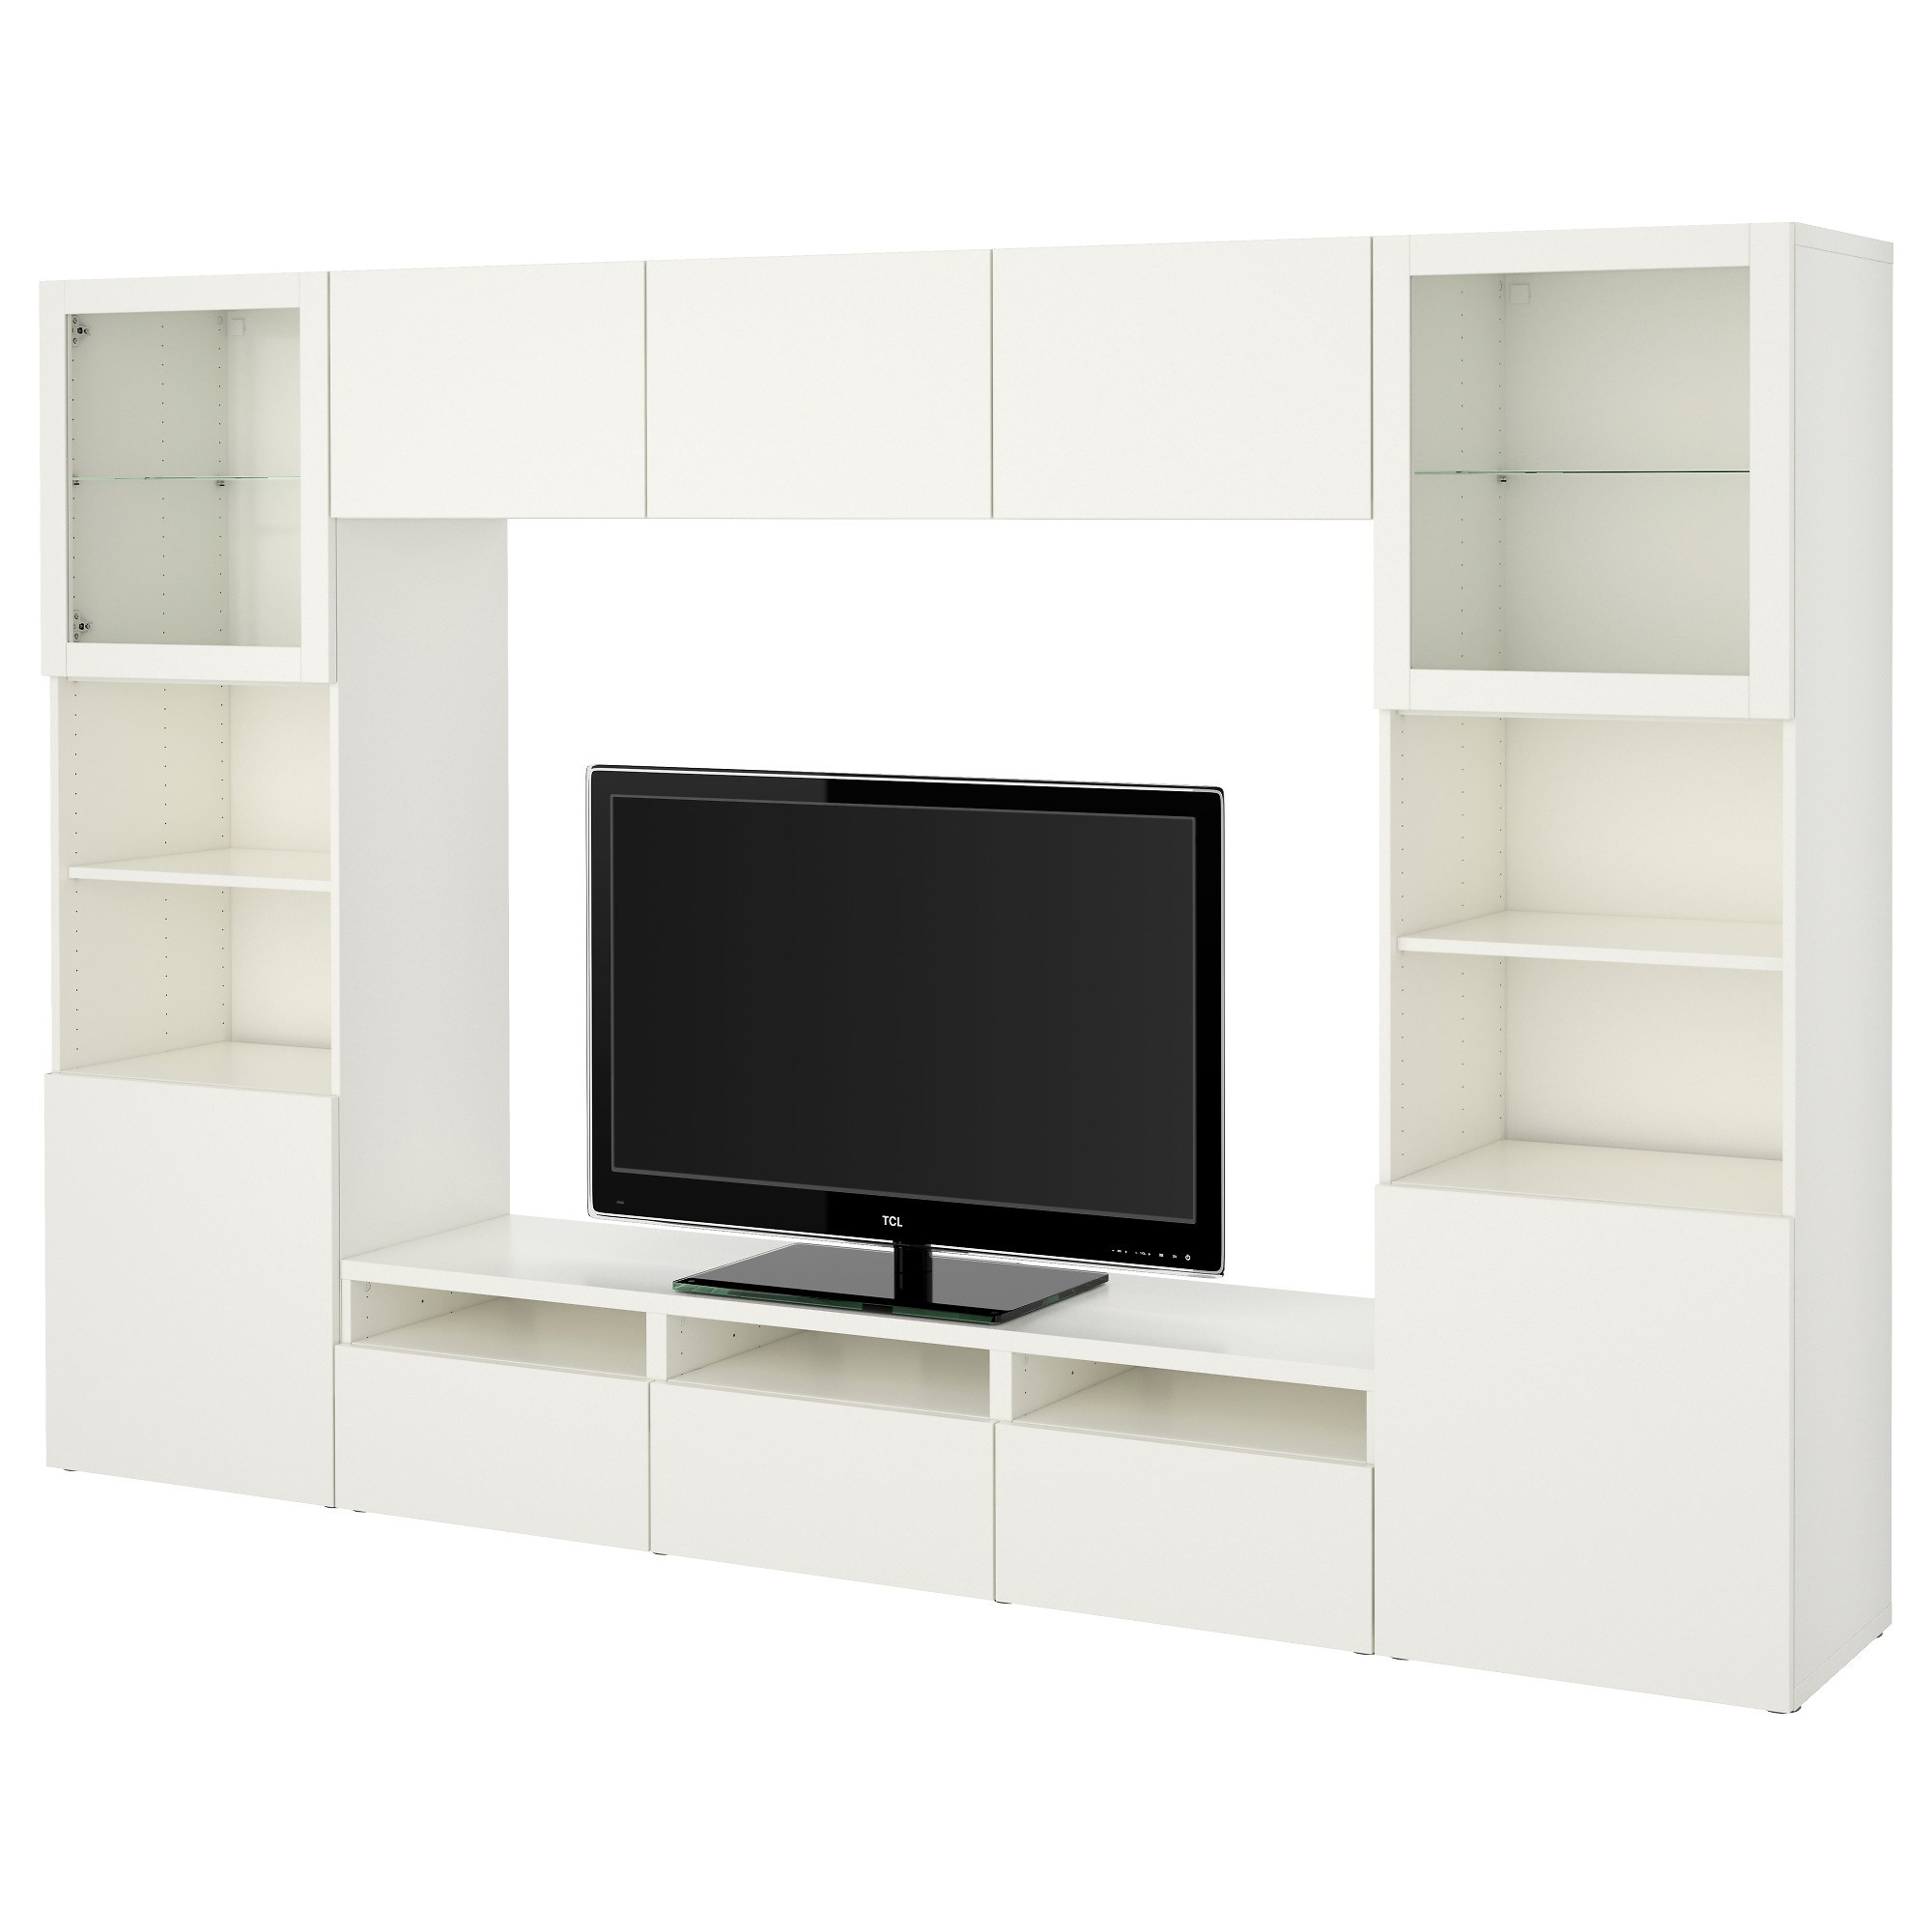 BESTA/LAPPVIKEN tv storage unit white 300x40x192 cm | IKEA